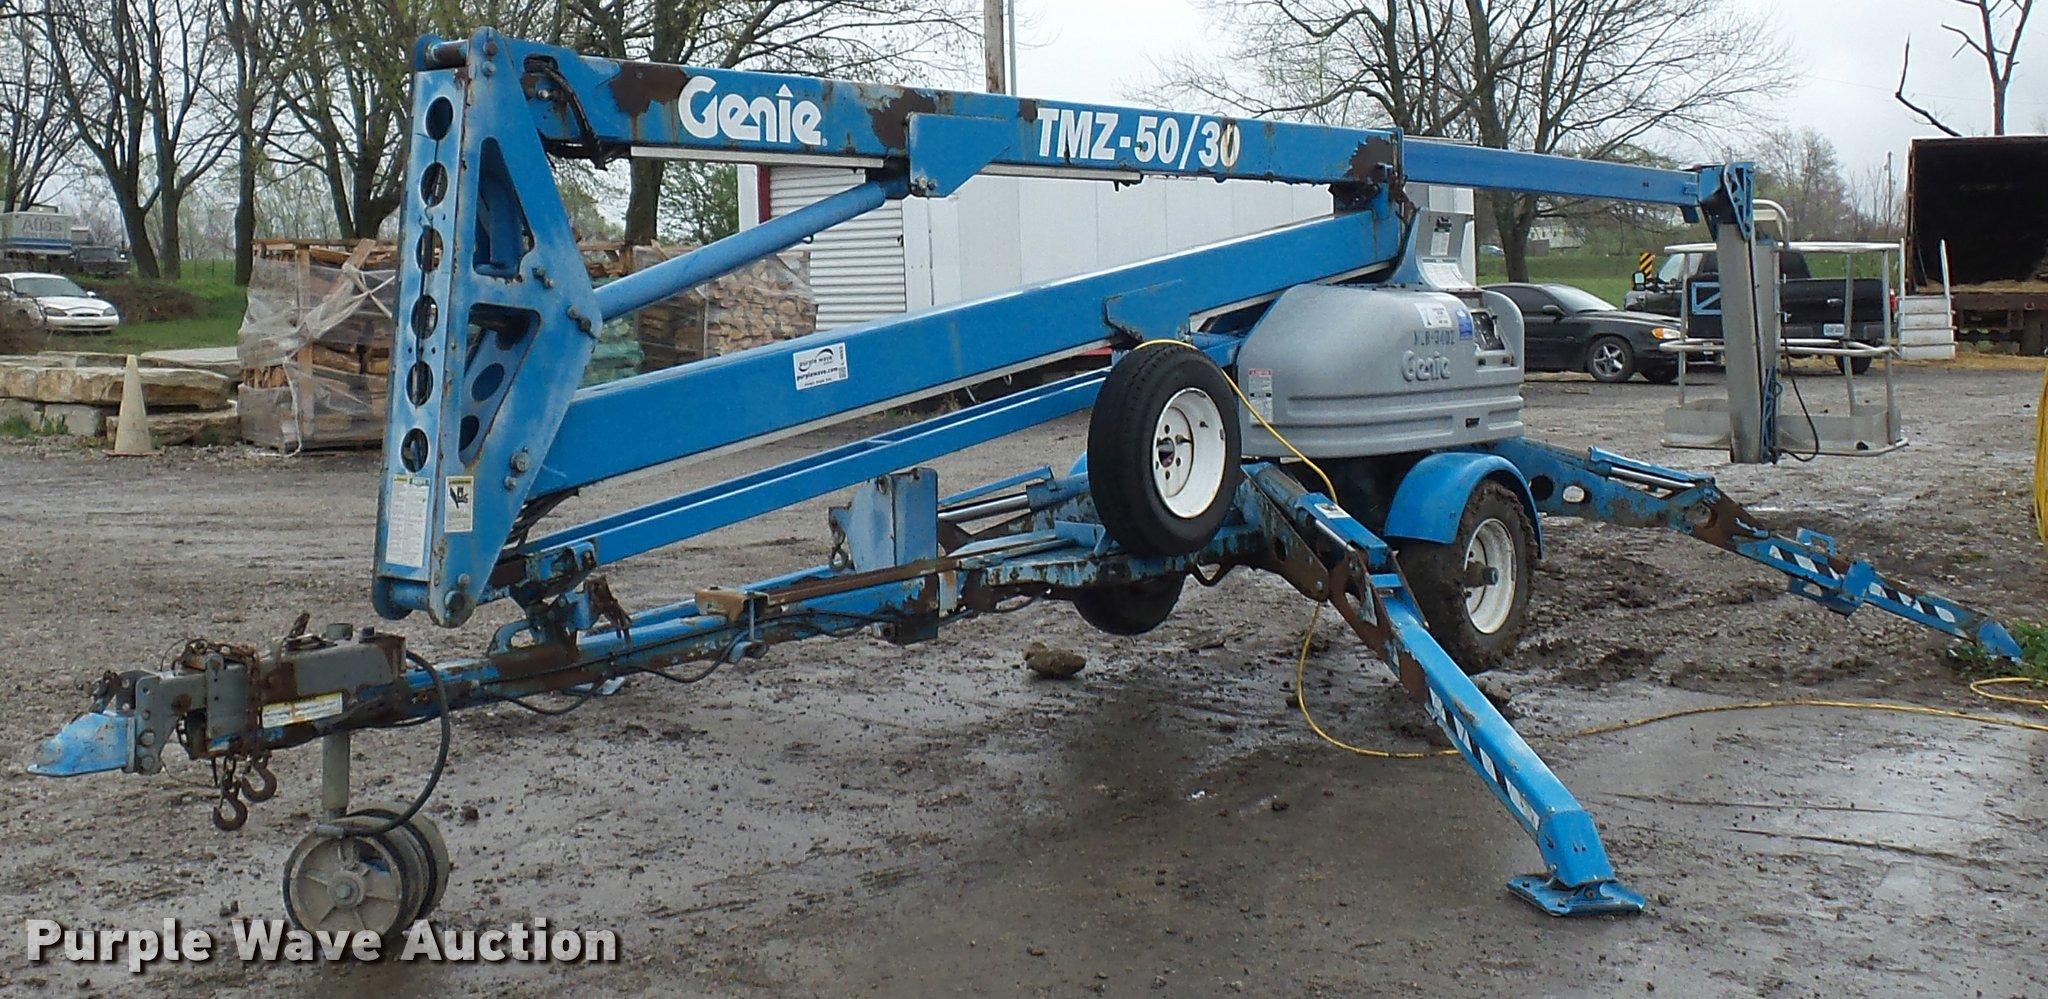 L4653 image for item L4653 2001 Genie TMZ-50/30 ...